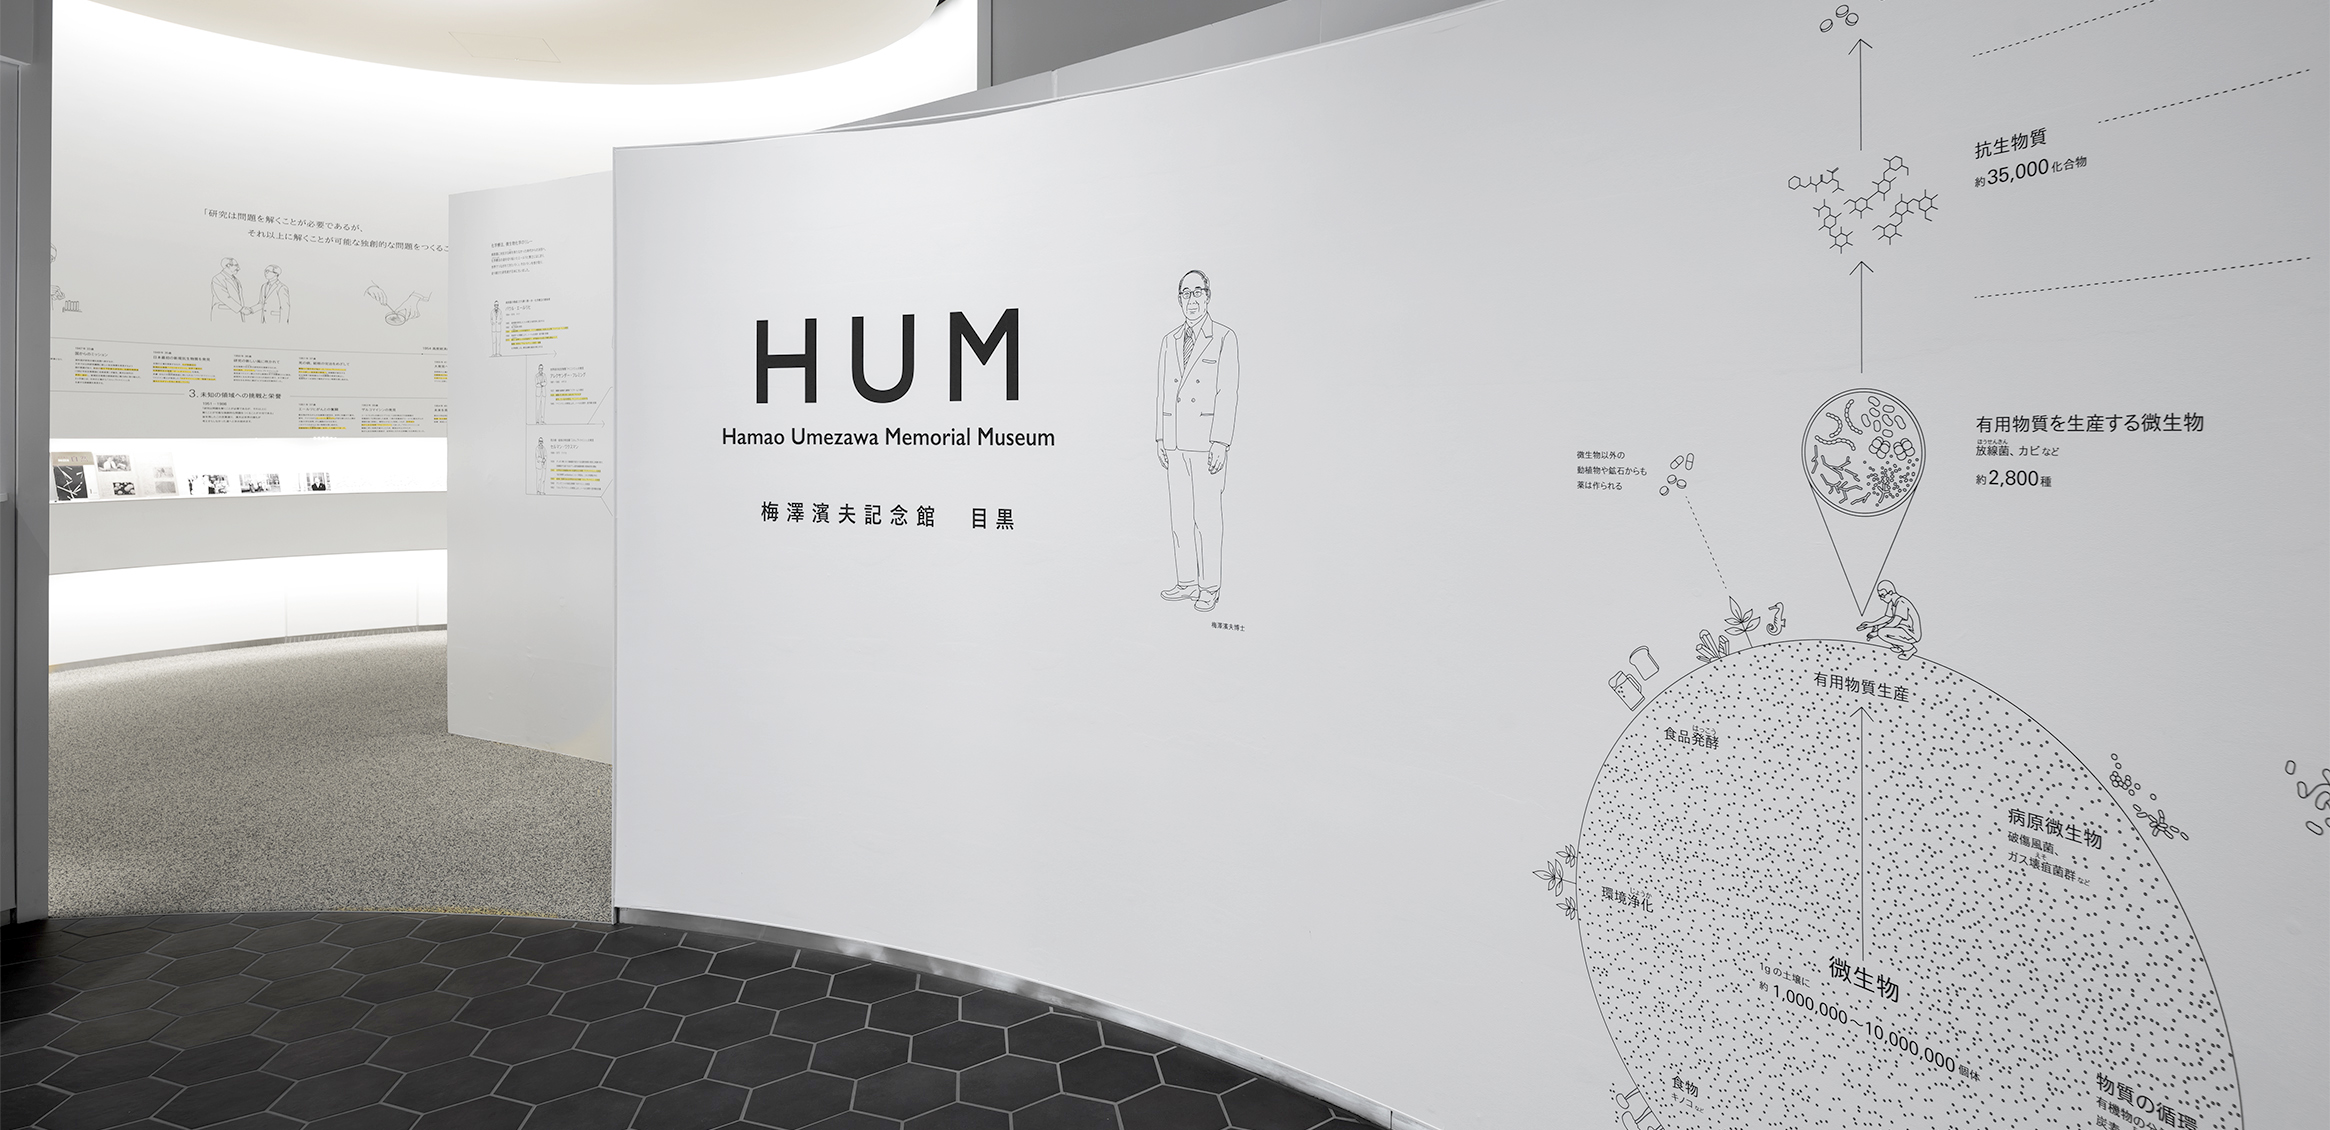 HUM Hamao Umezawa Memorial Museum0枚目